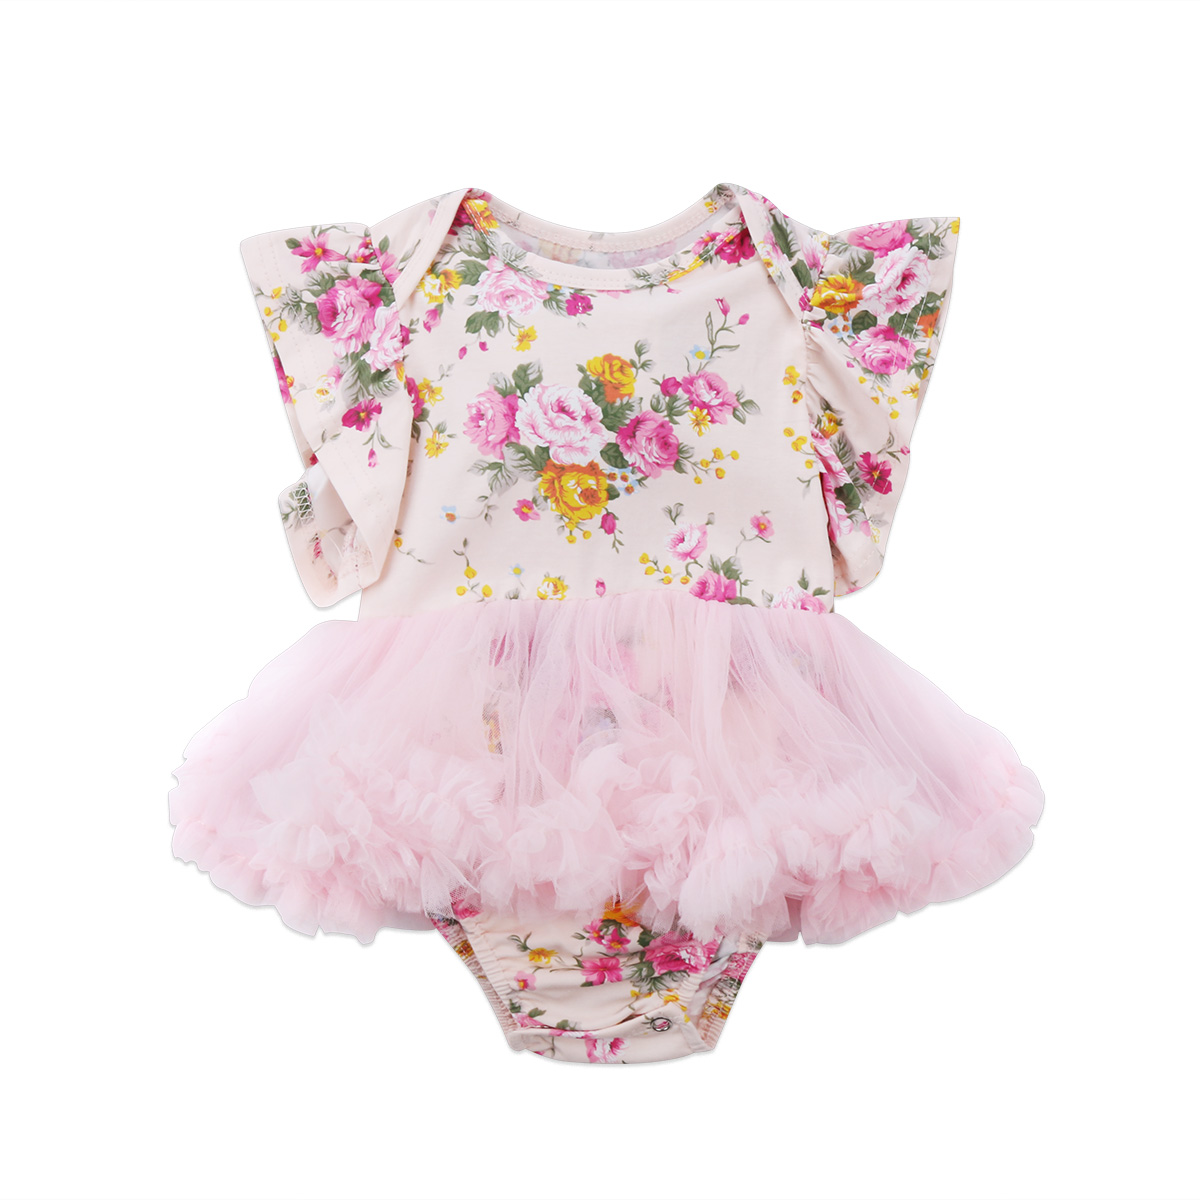 Floral Romper Jumpsuit Tulle Dresses Cute Princess Newborn Baby Girls Clothes Set